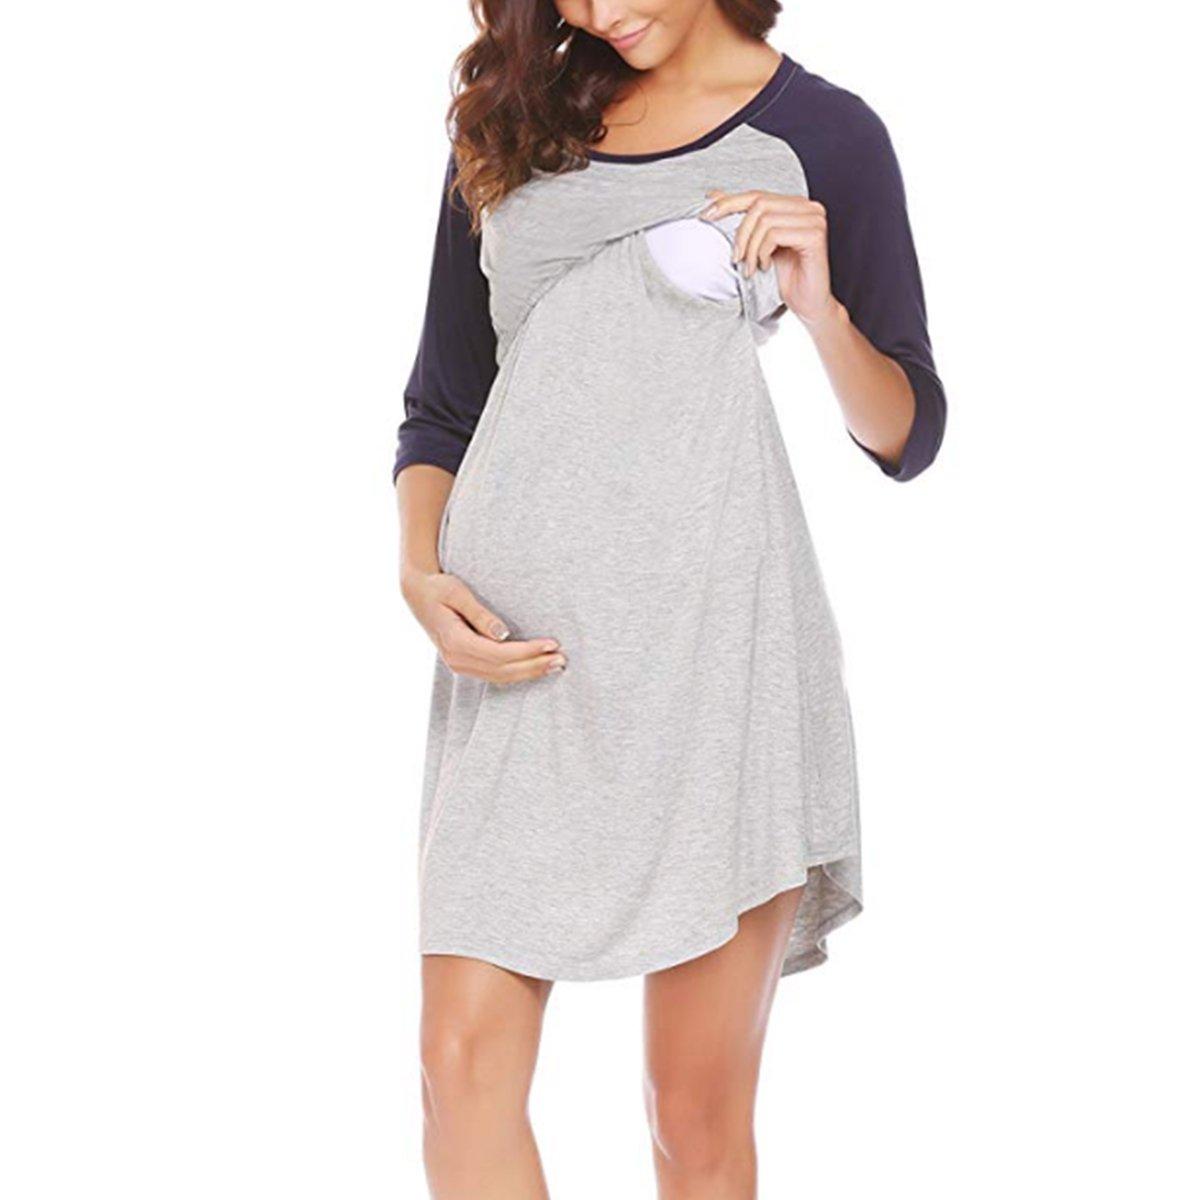 Yinuoday Women's Maternity Dress 3/4 Sleeve Nursing Nightgown for Breastfeeding Sleepwear M-XXL (Navy Blue, XL)